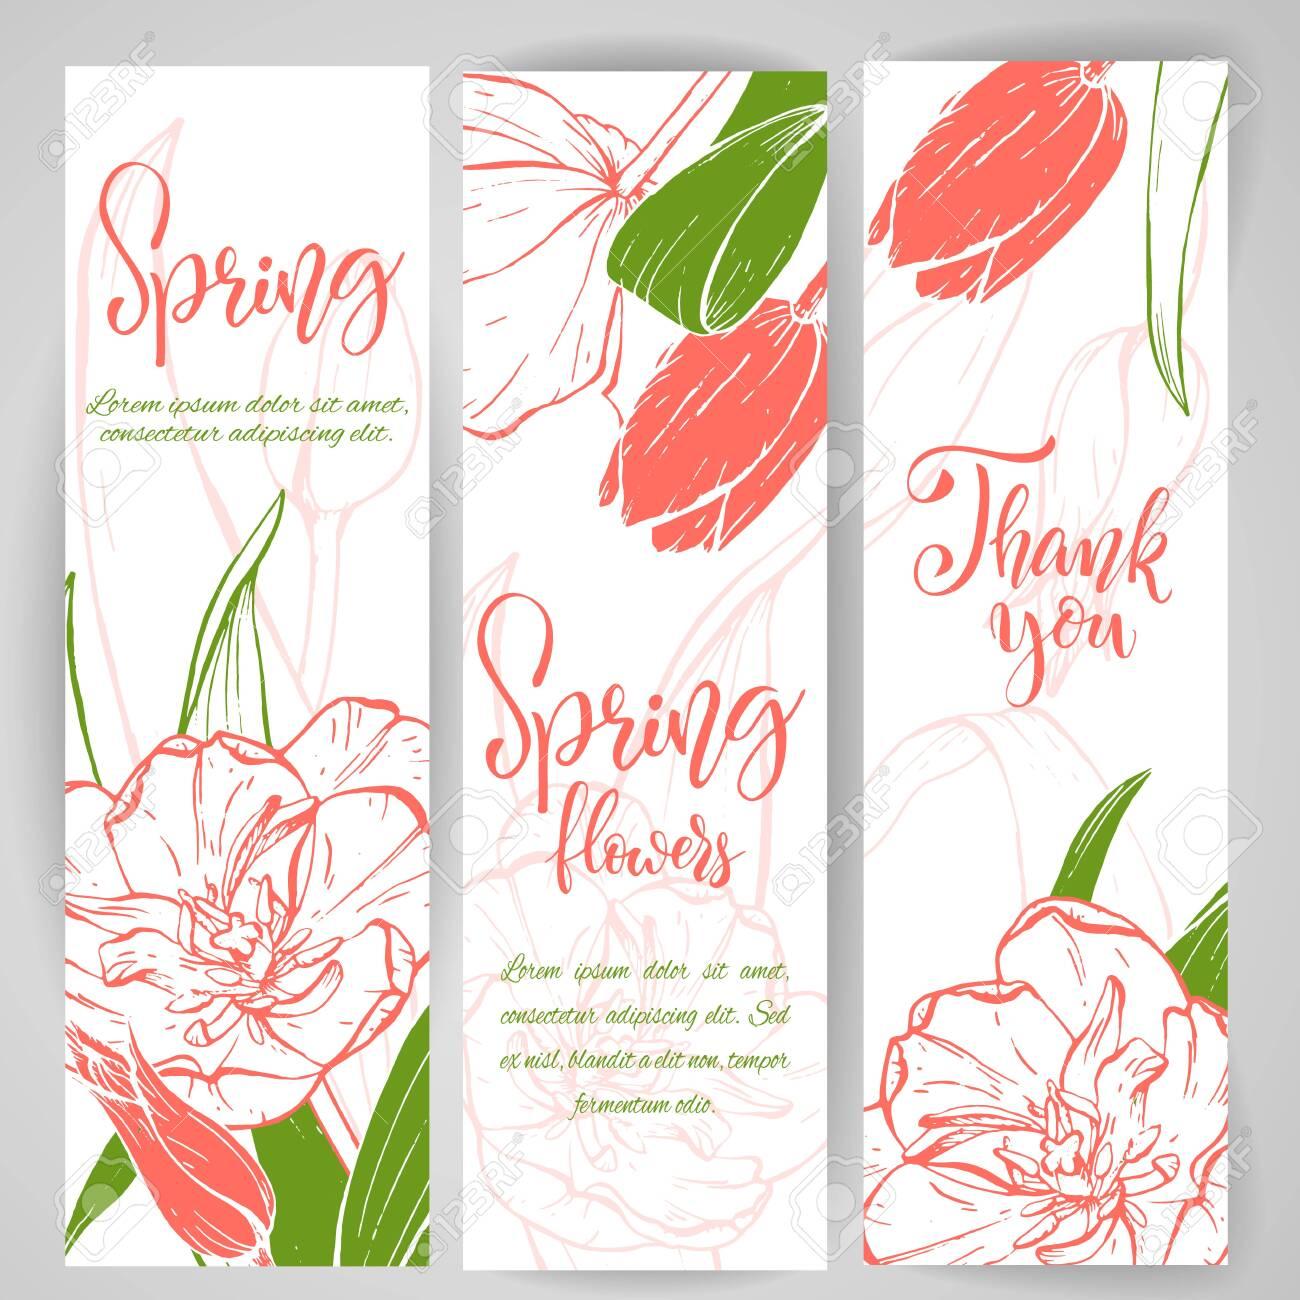 Sketch linear tulip blossom. - 128391025